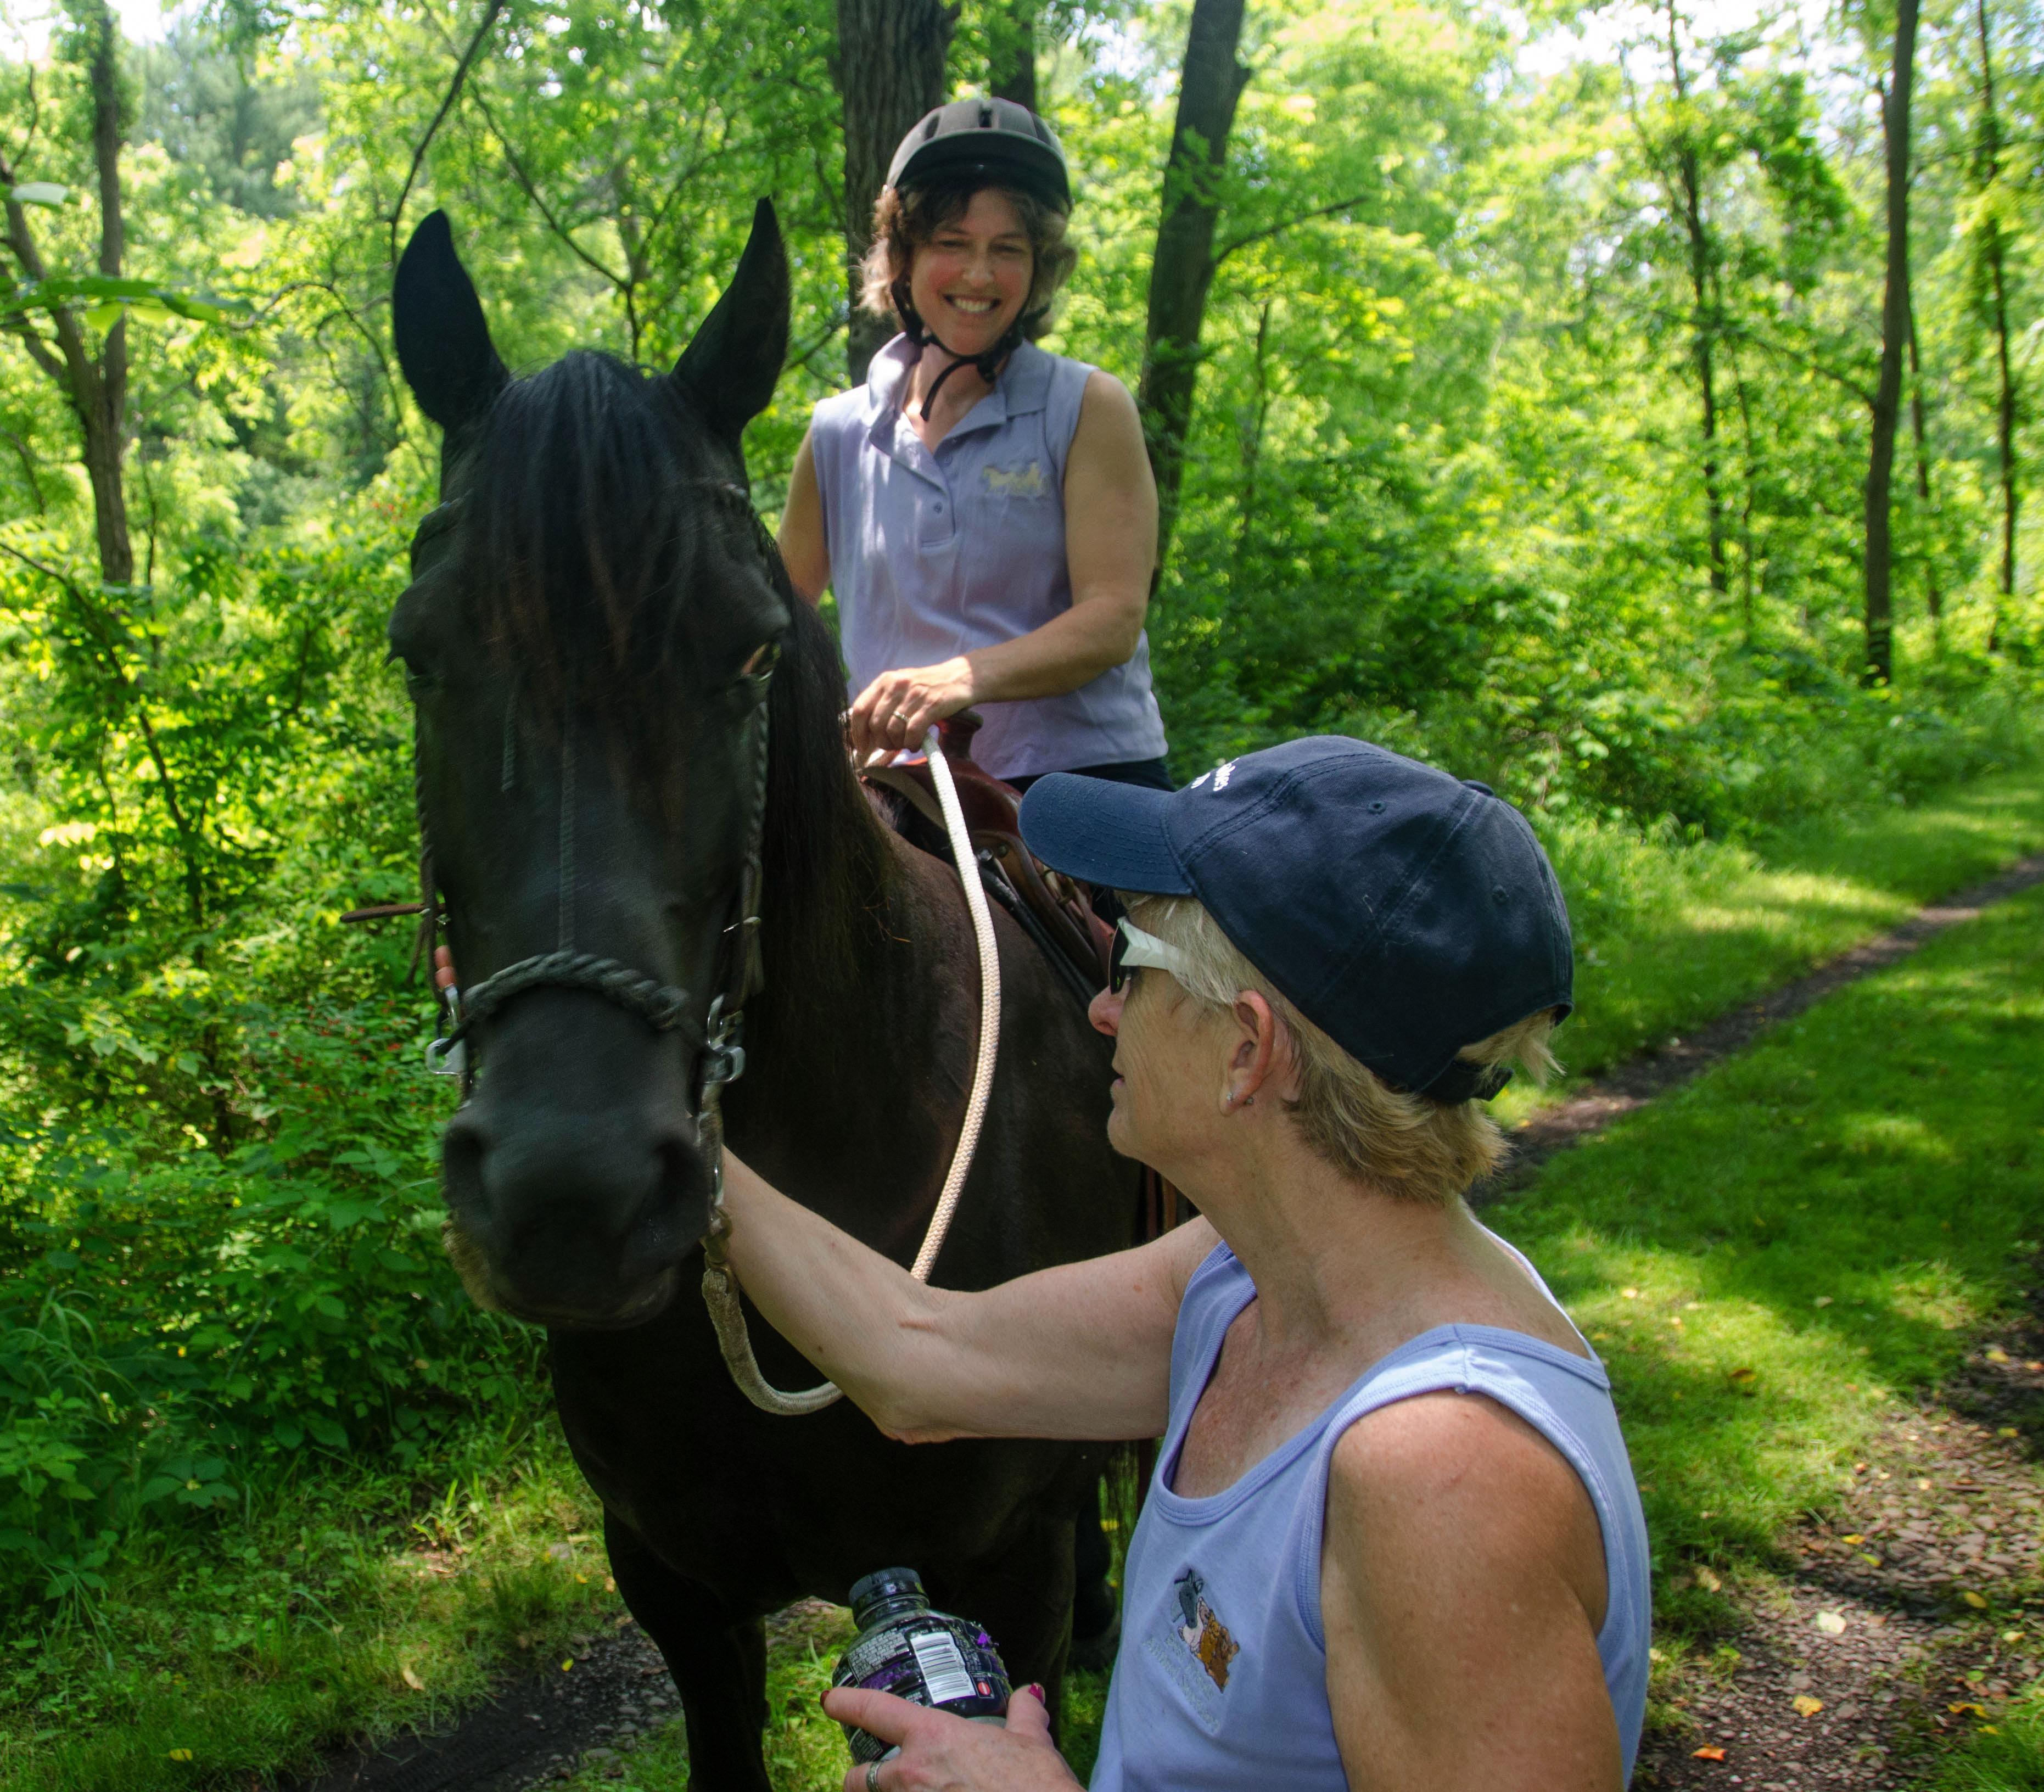 SK Horseback